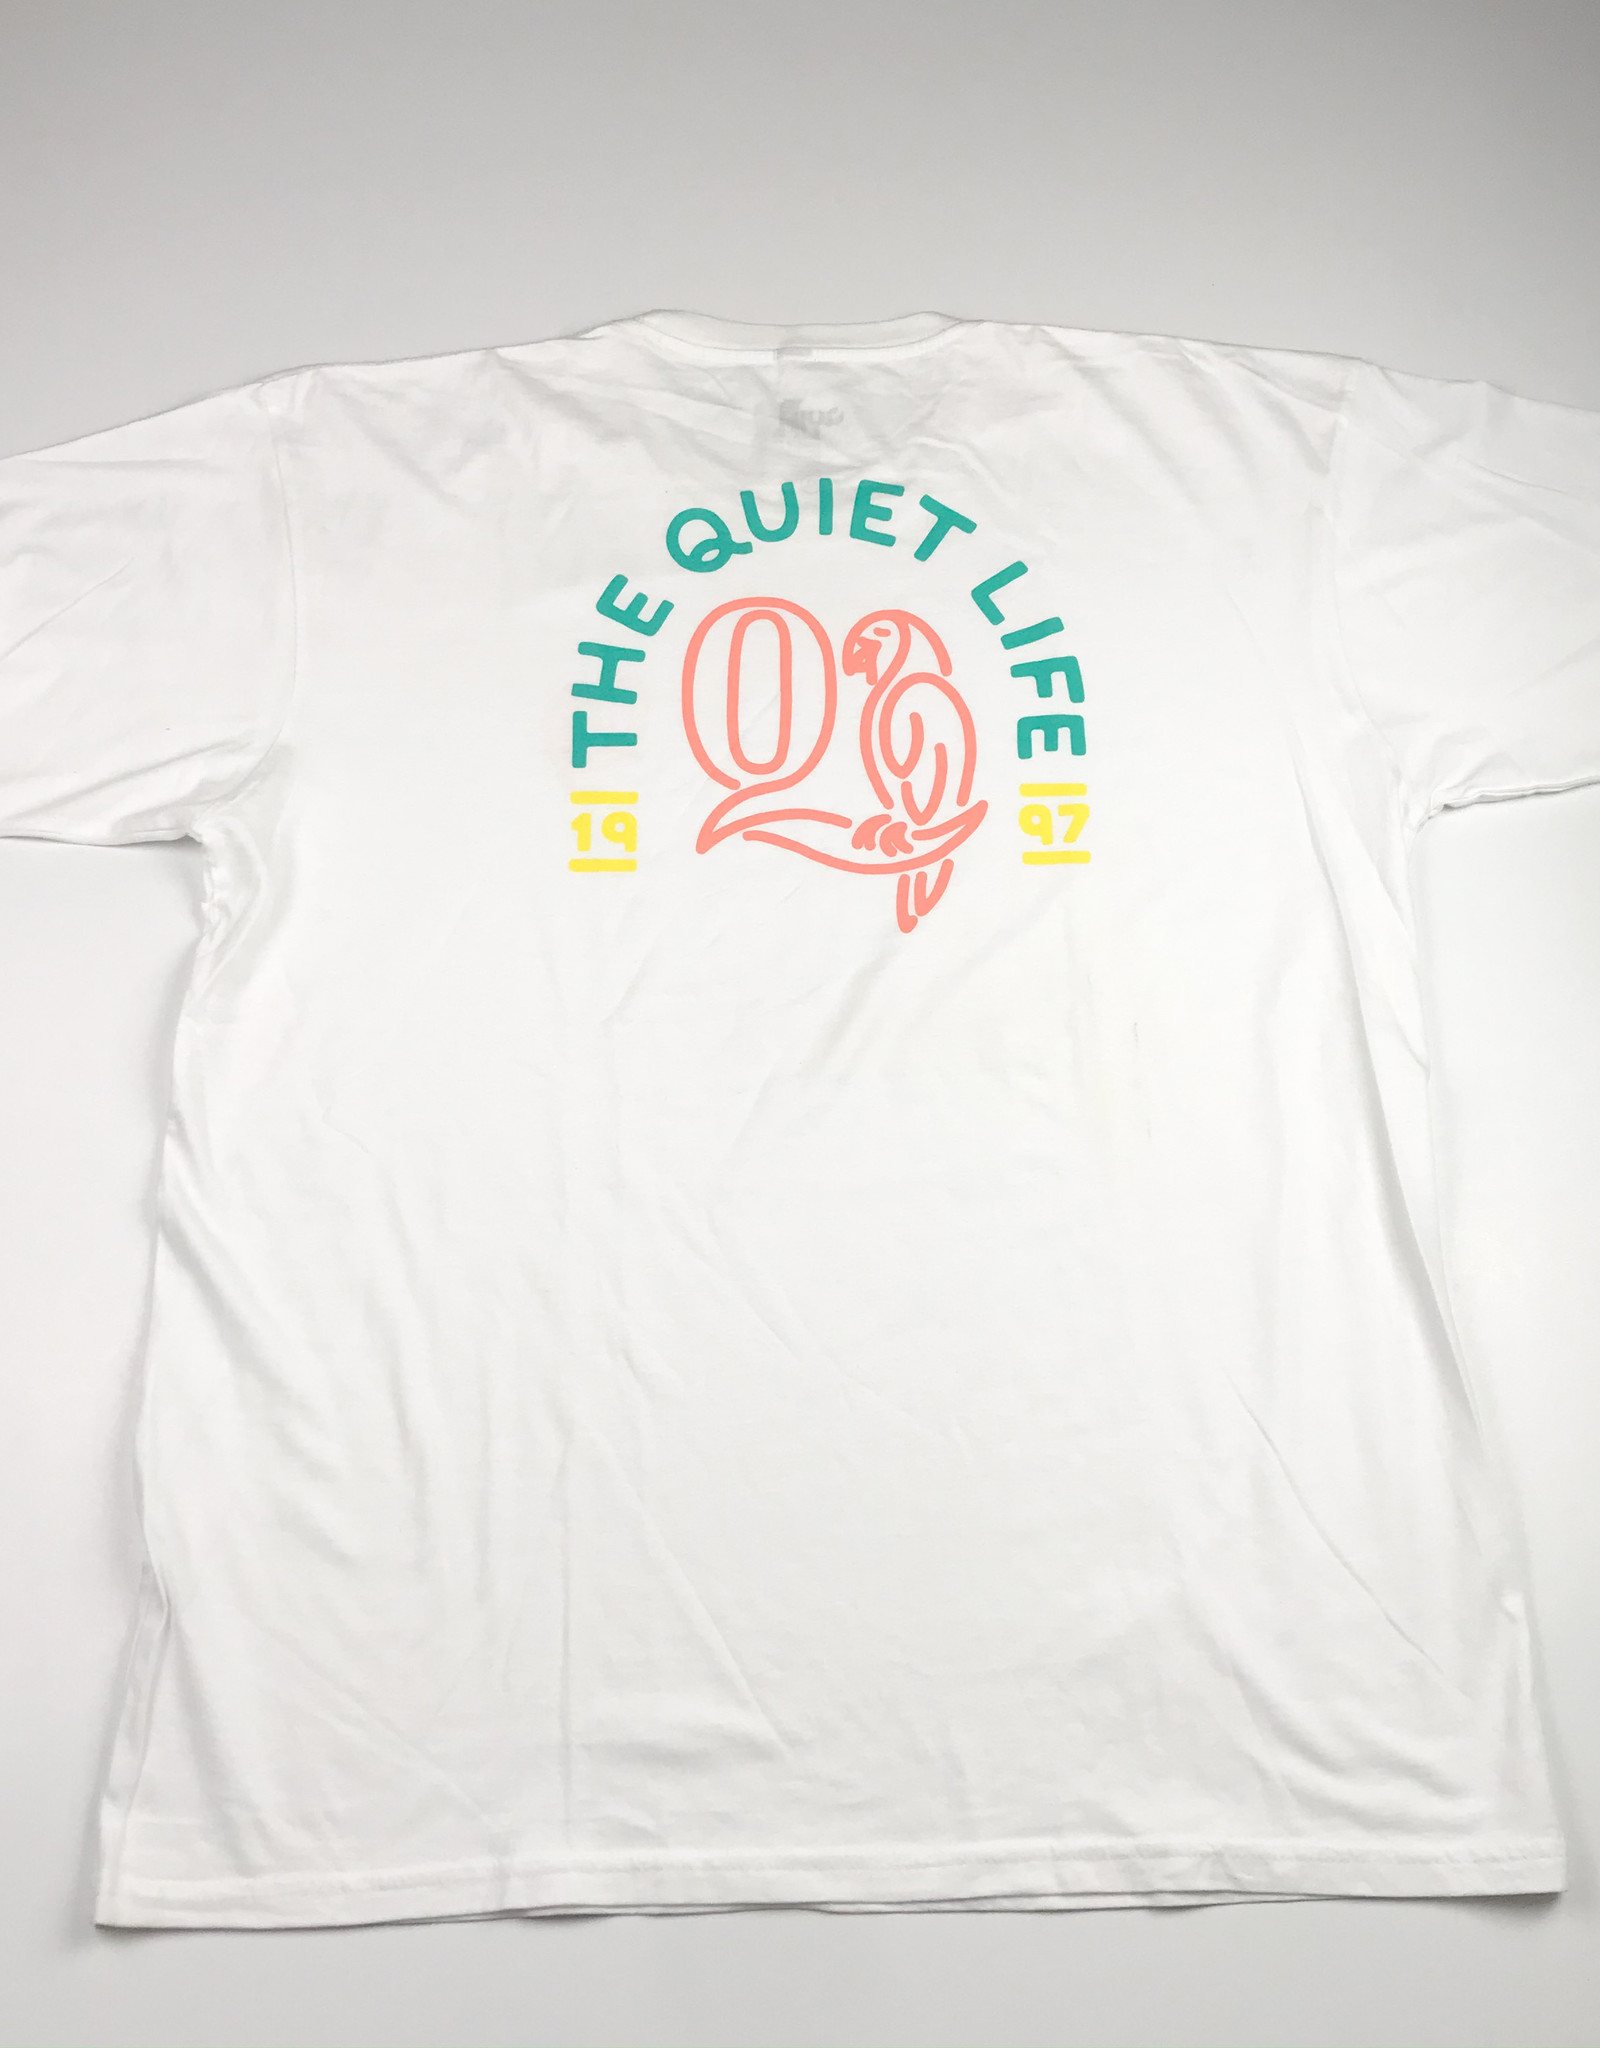 THE QUIET LIFE PARROT TEE